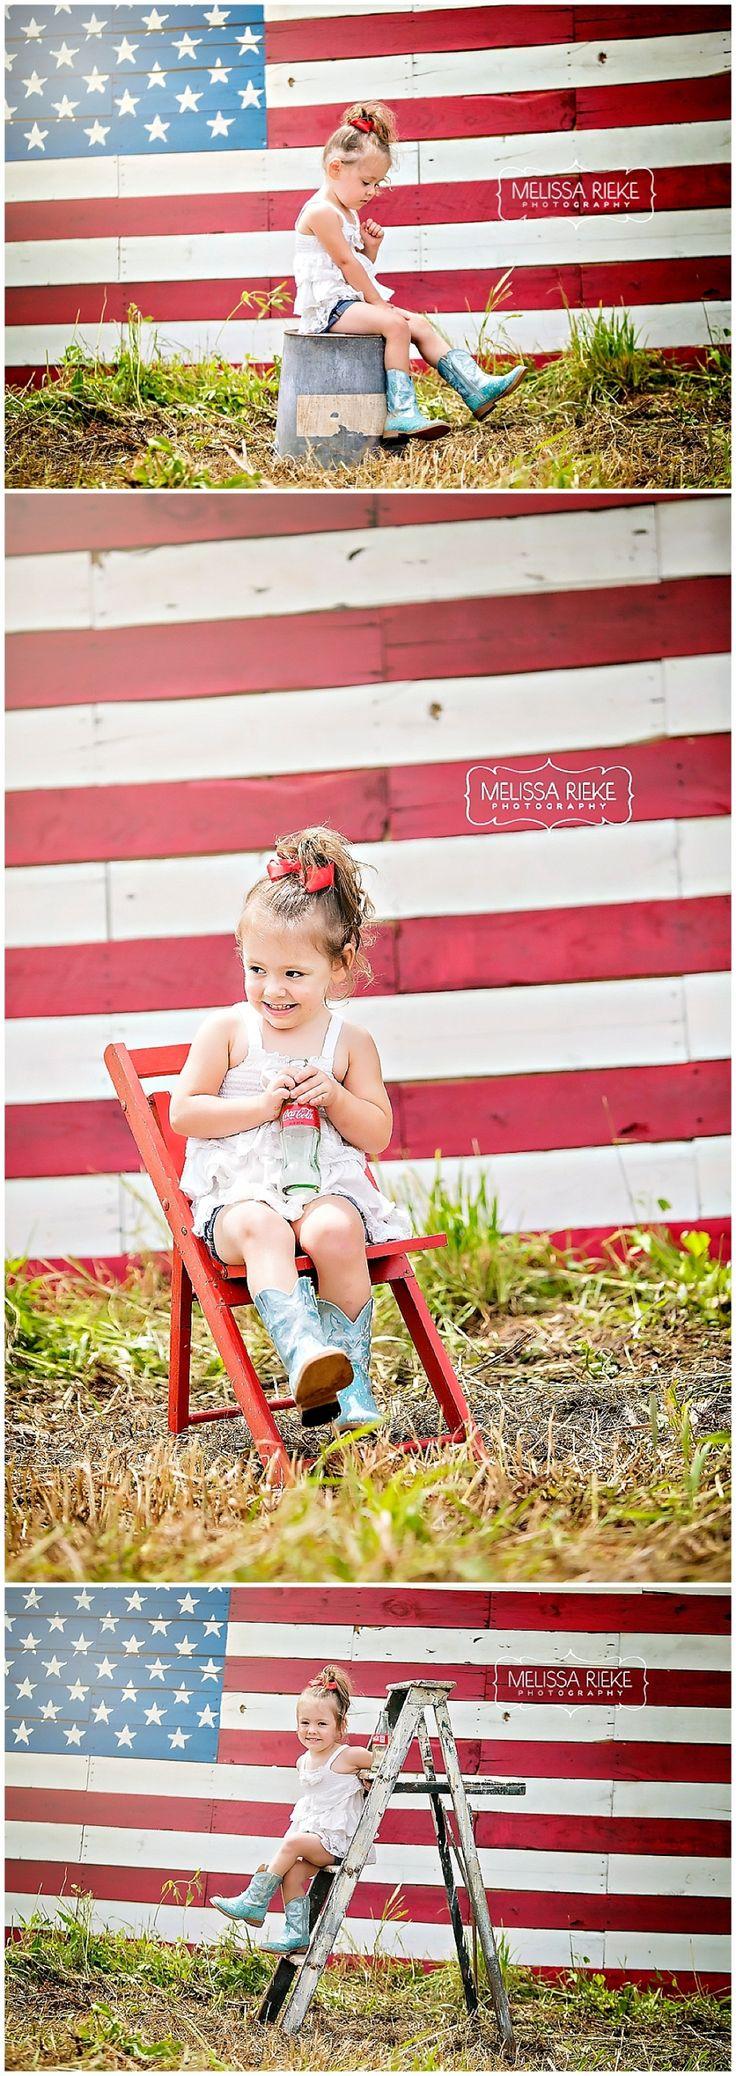 Vintage Americana - Melissa Rieke Photography - Kansas City Photographer - Flag - Forth of July